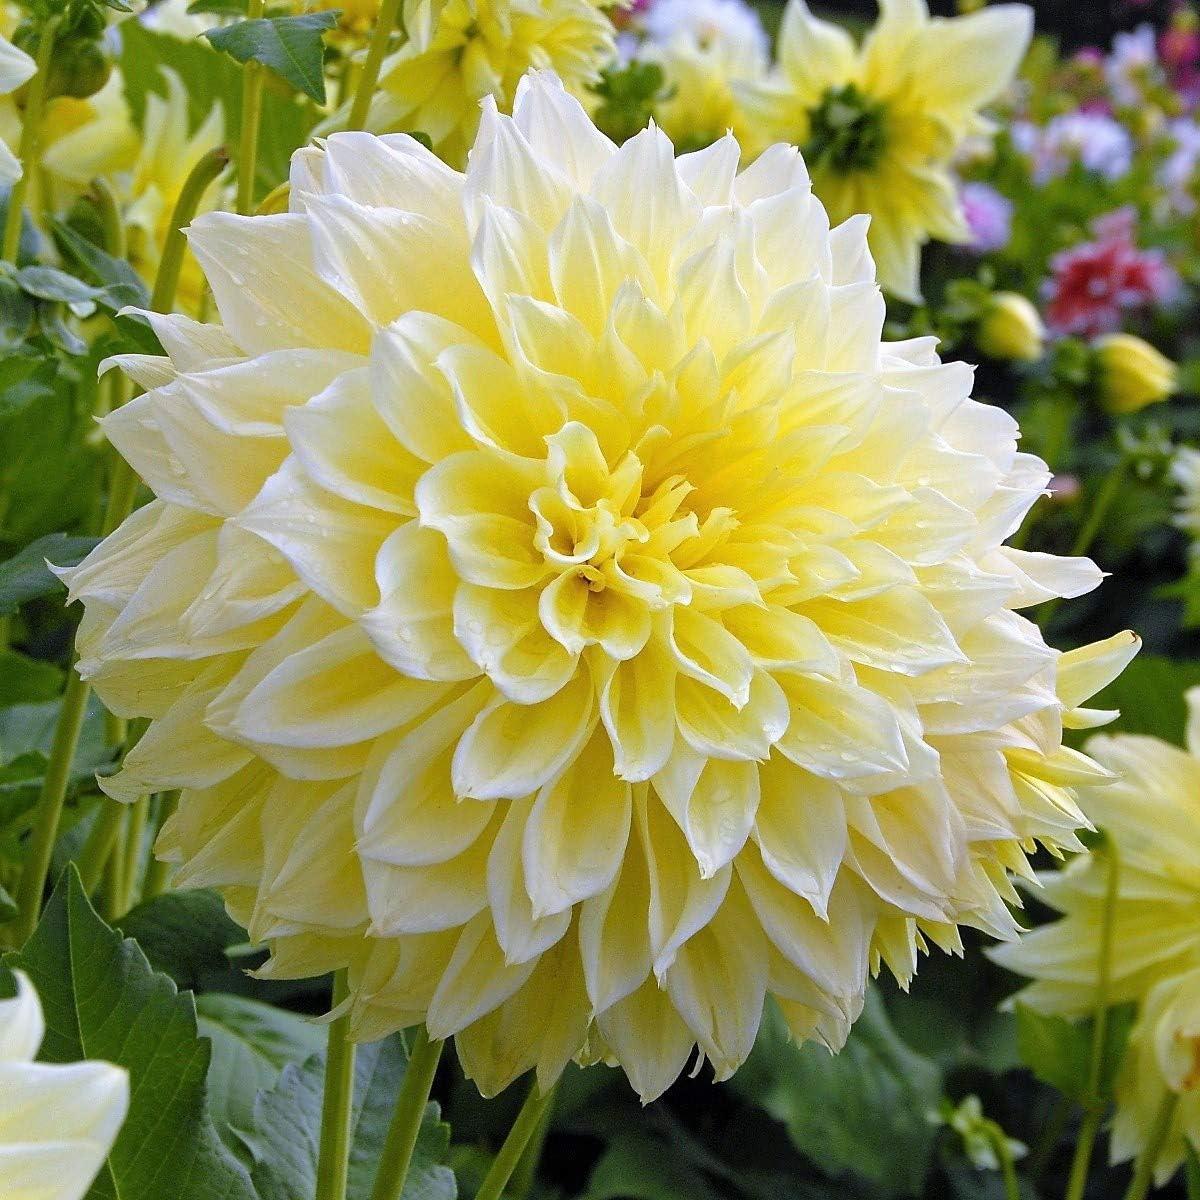 3 Humphreys Garden/® Dinnerplate Dahlia Kelvin Floodlight Tuber Pretty Yellow Flowers.Grade I